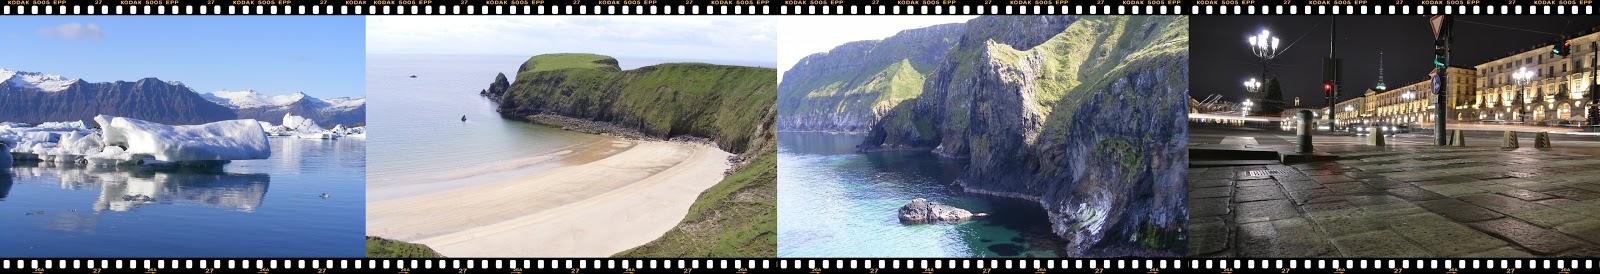 Retrospectiva 2012: Islanda, Irlanda, Irlanda de Nord, Italia